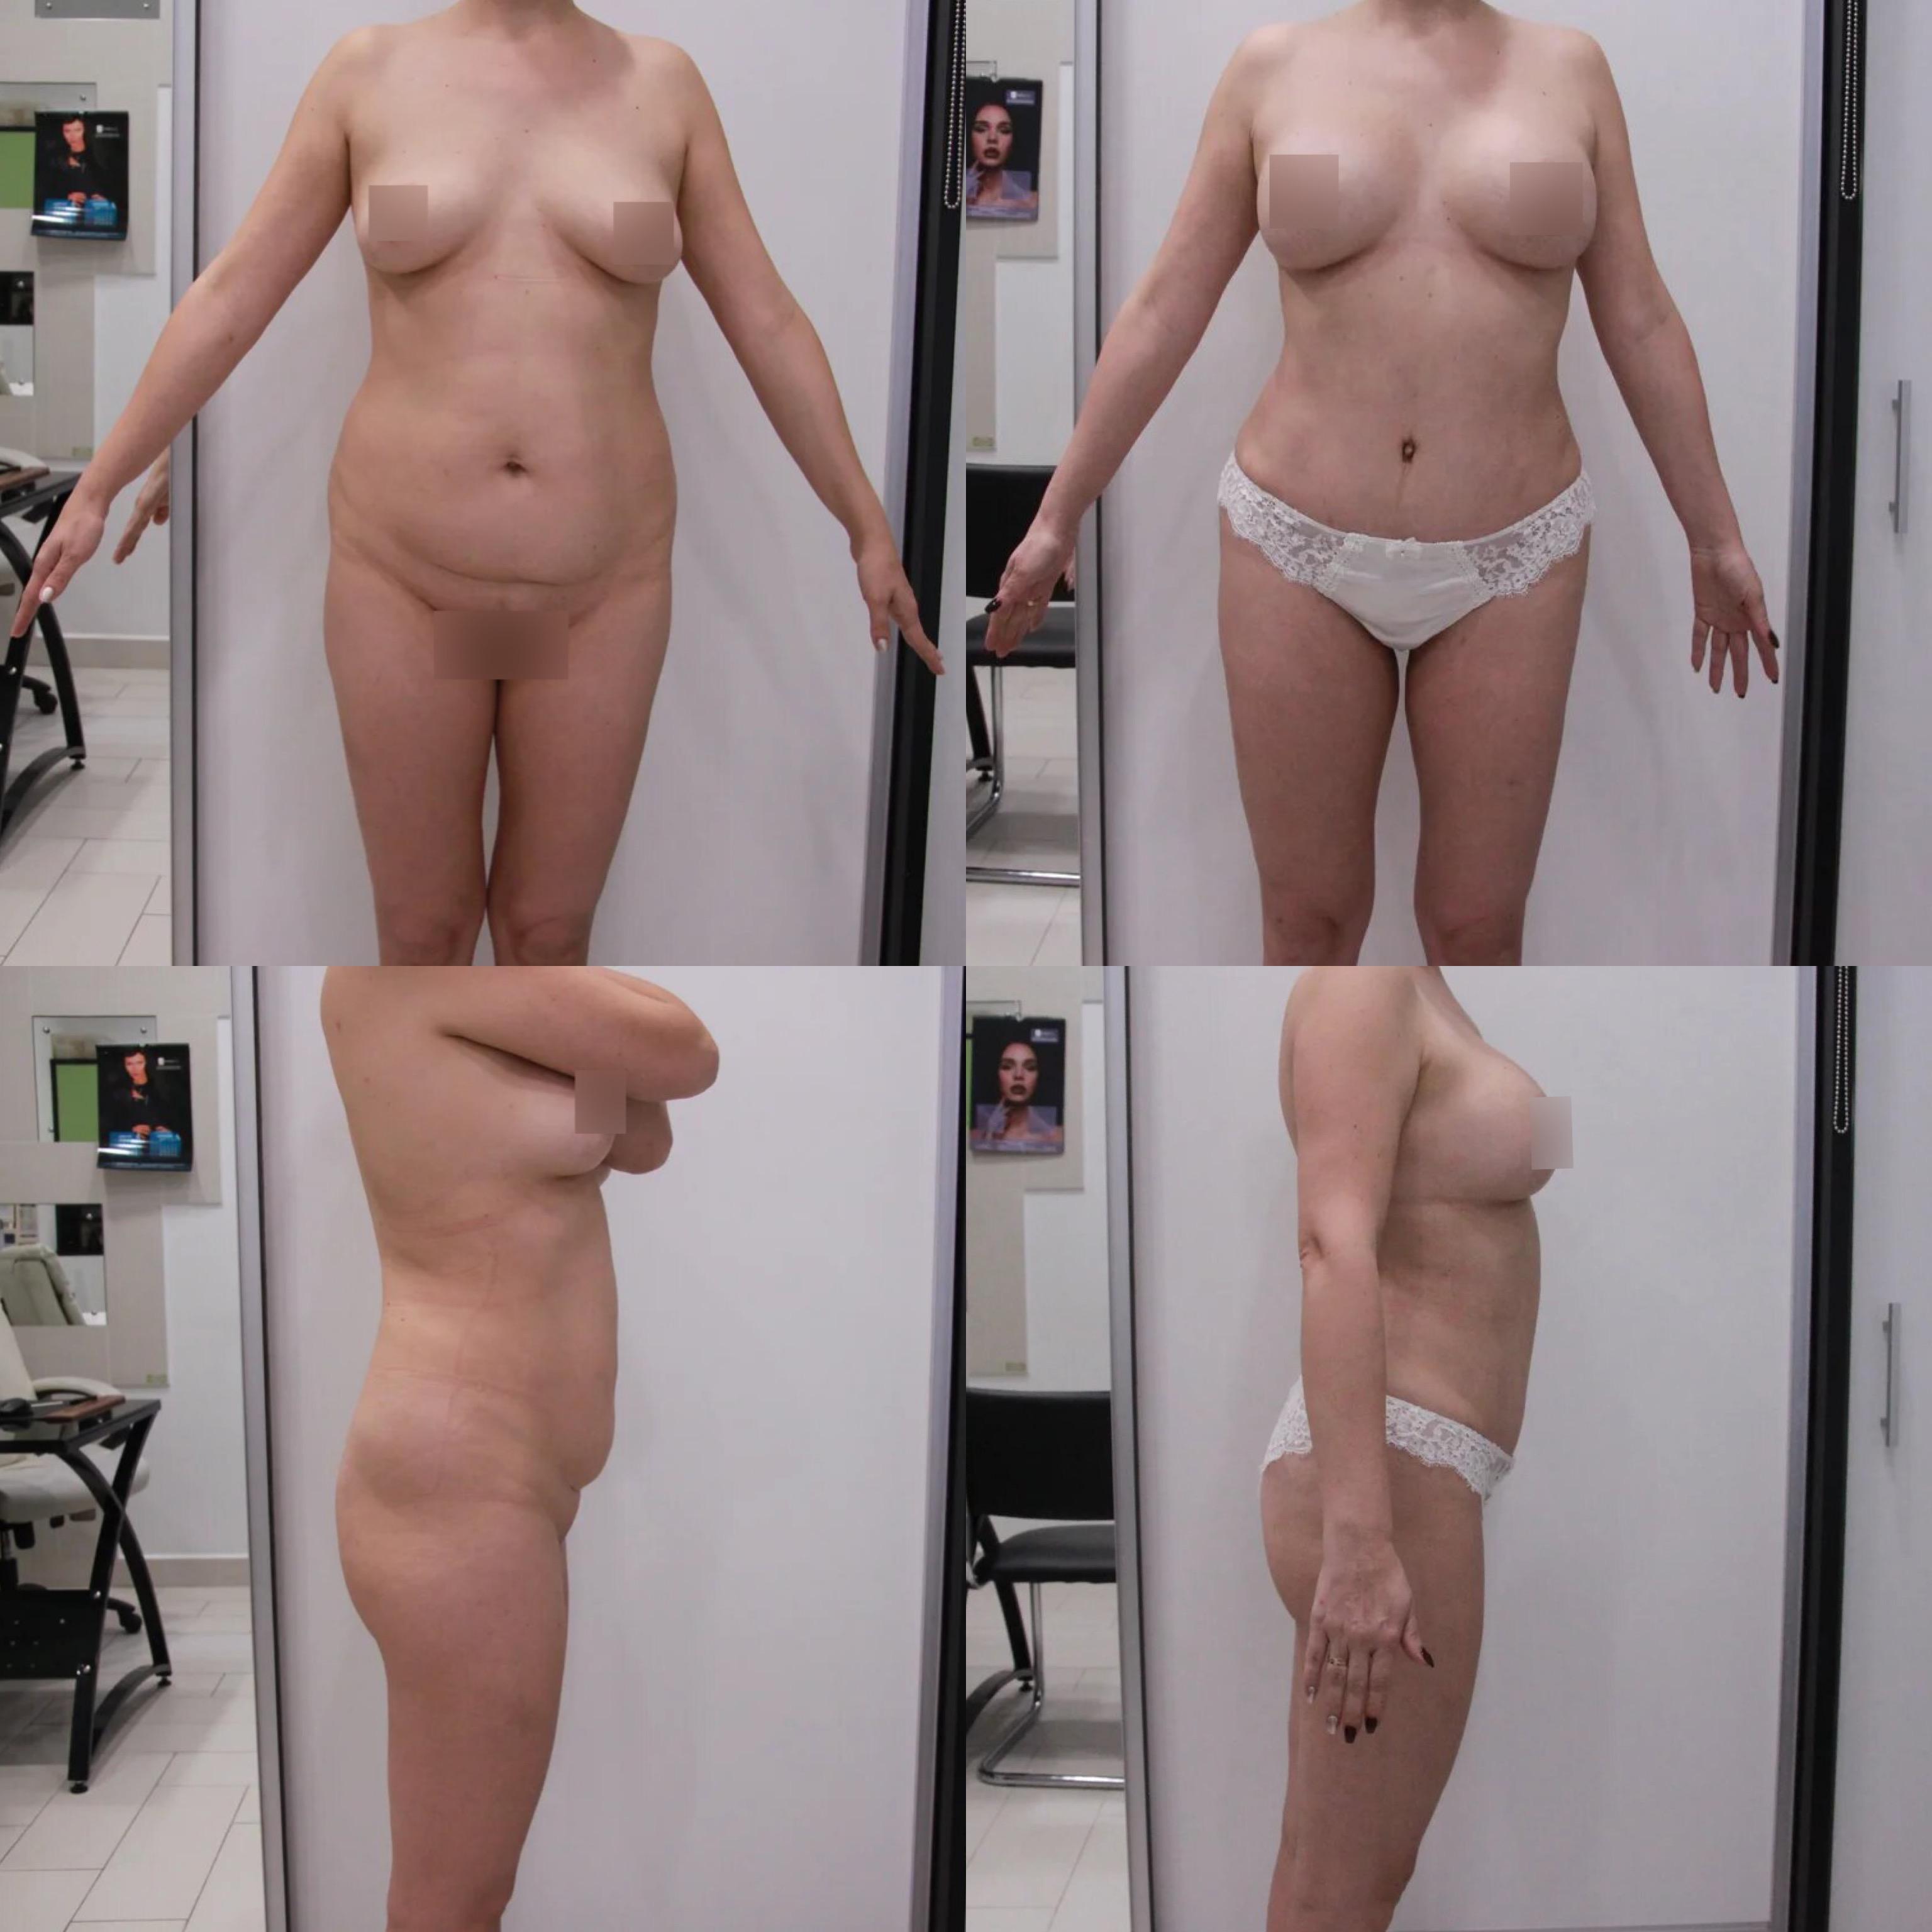 Абдоминопластика, подтяжка груди, спустя 1 год